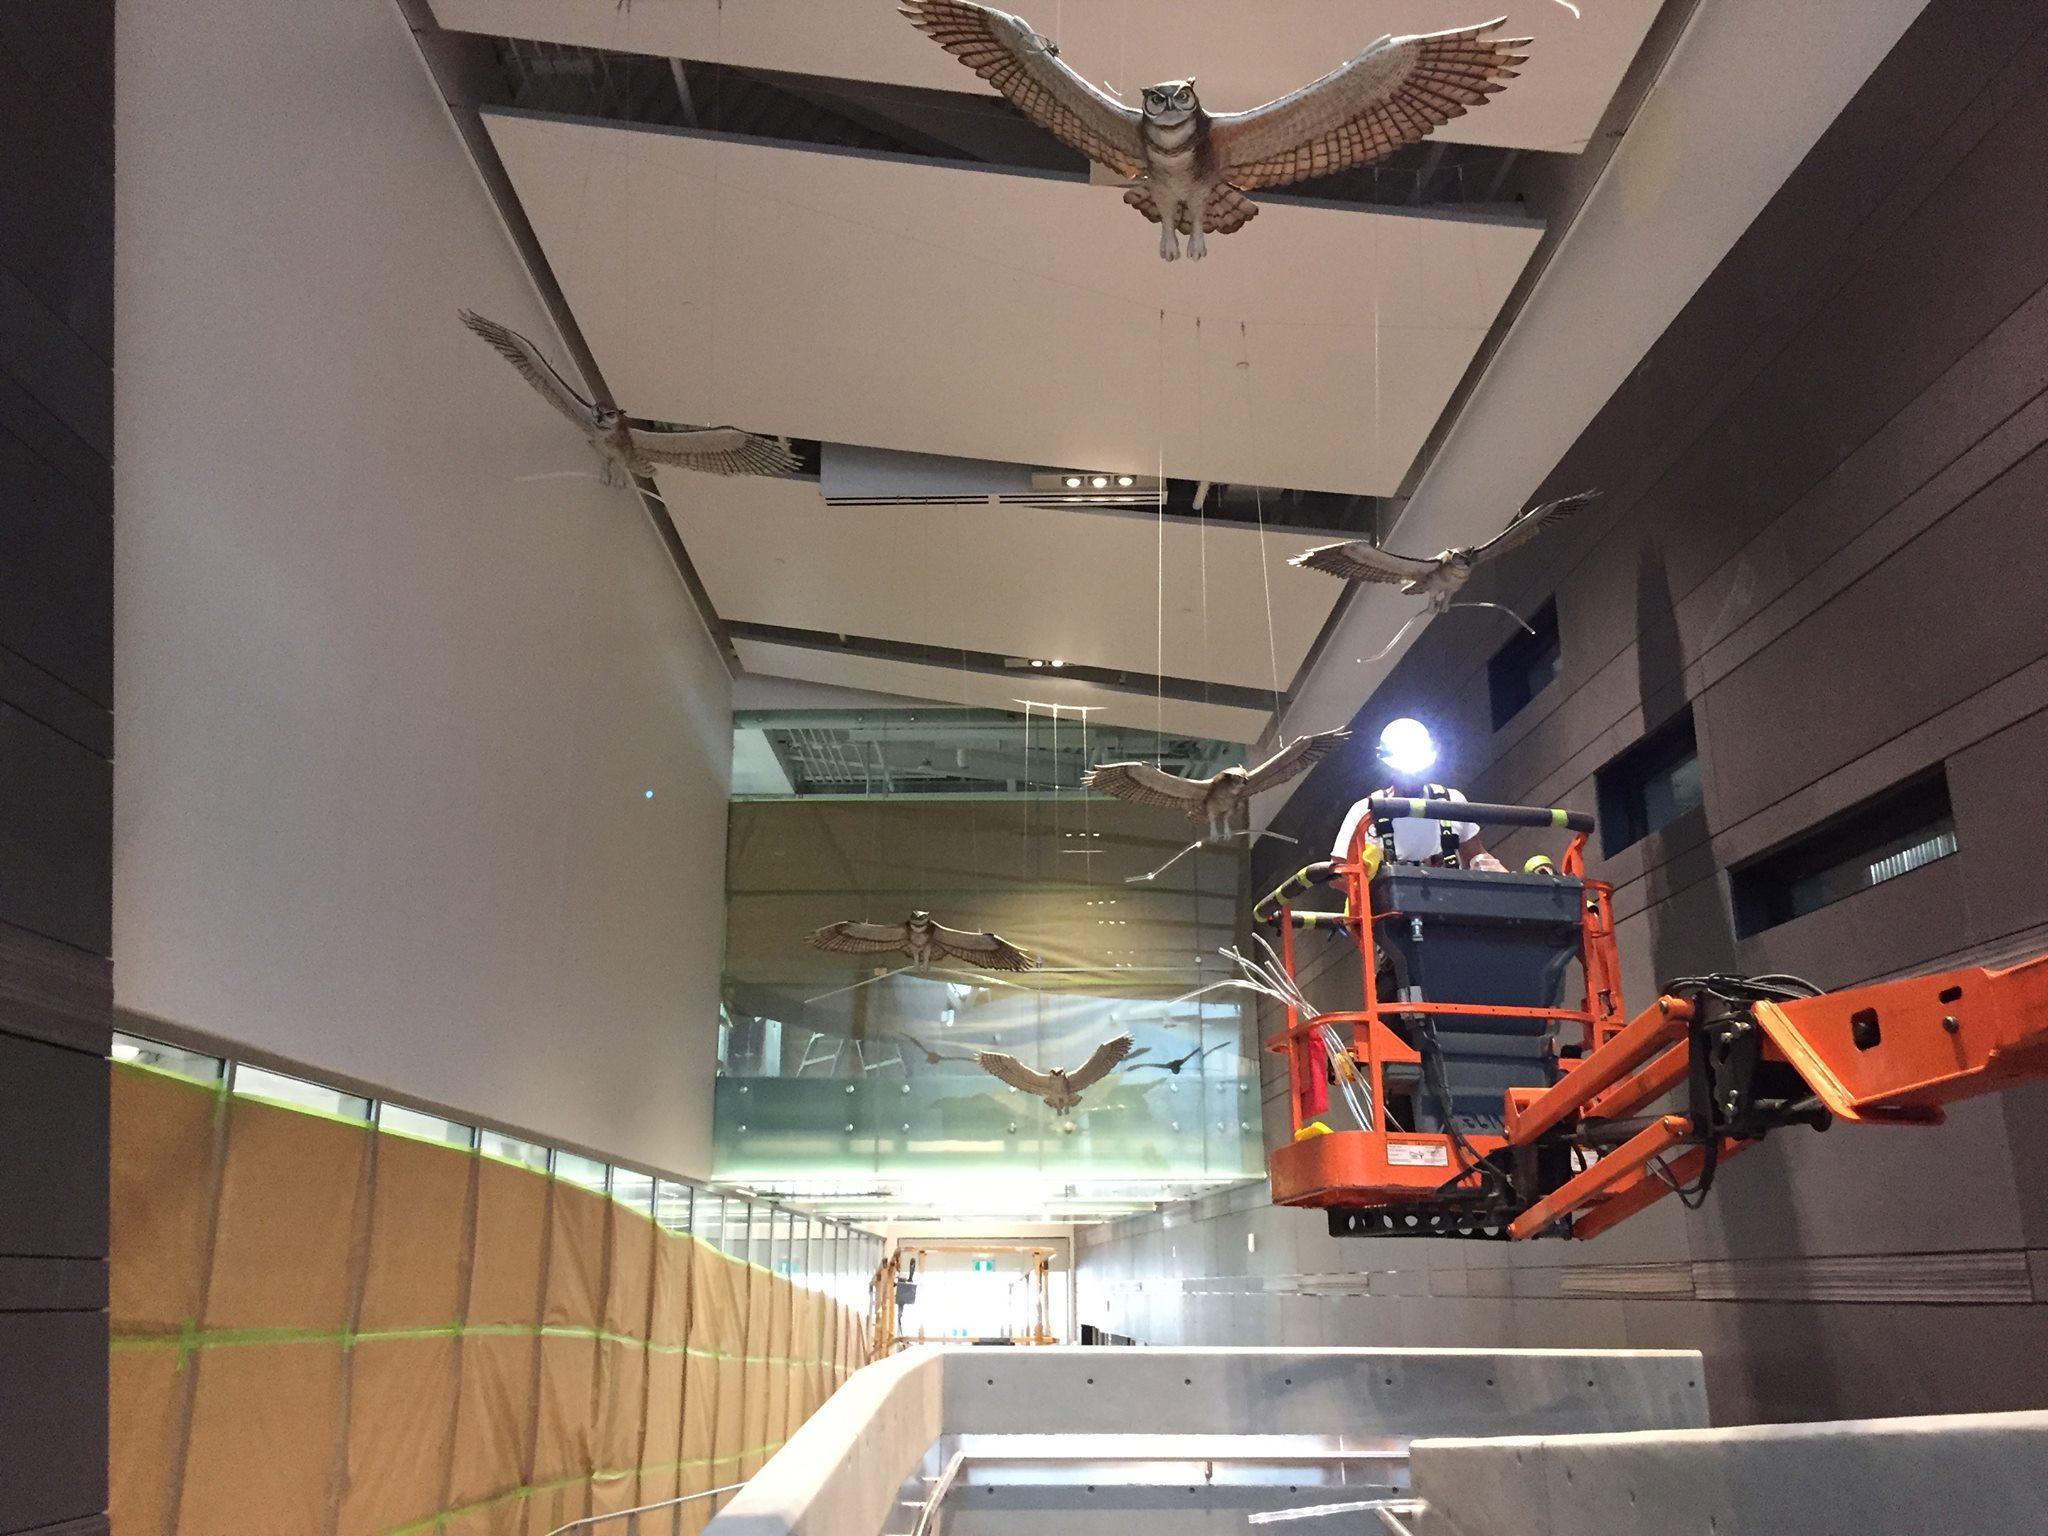 Calgary_The Nest_Donald Lipski_Public Art Services_J Grant Projects_18.jpg